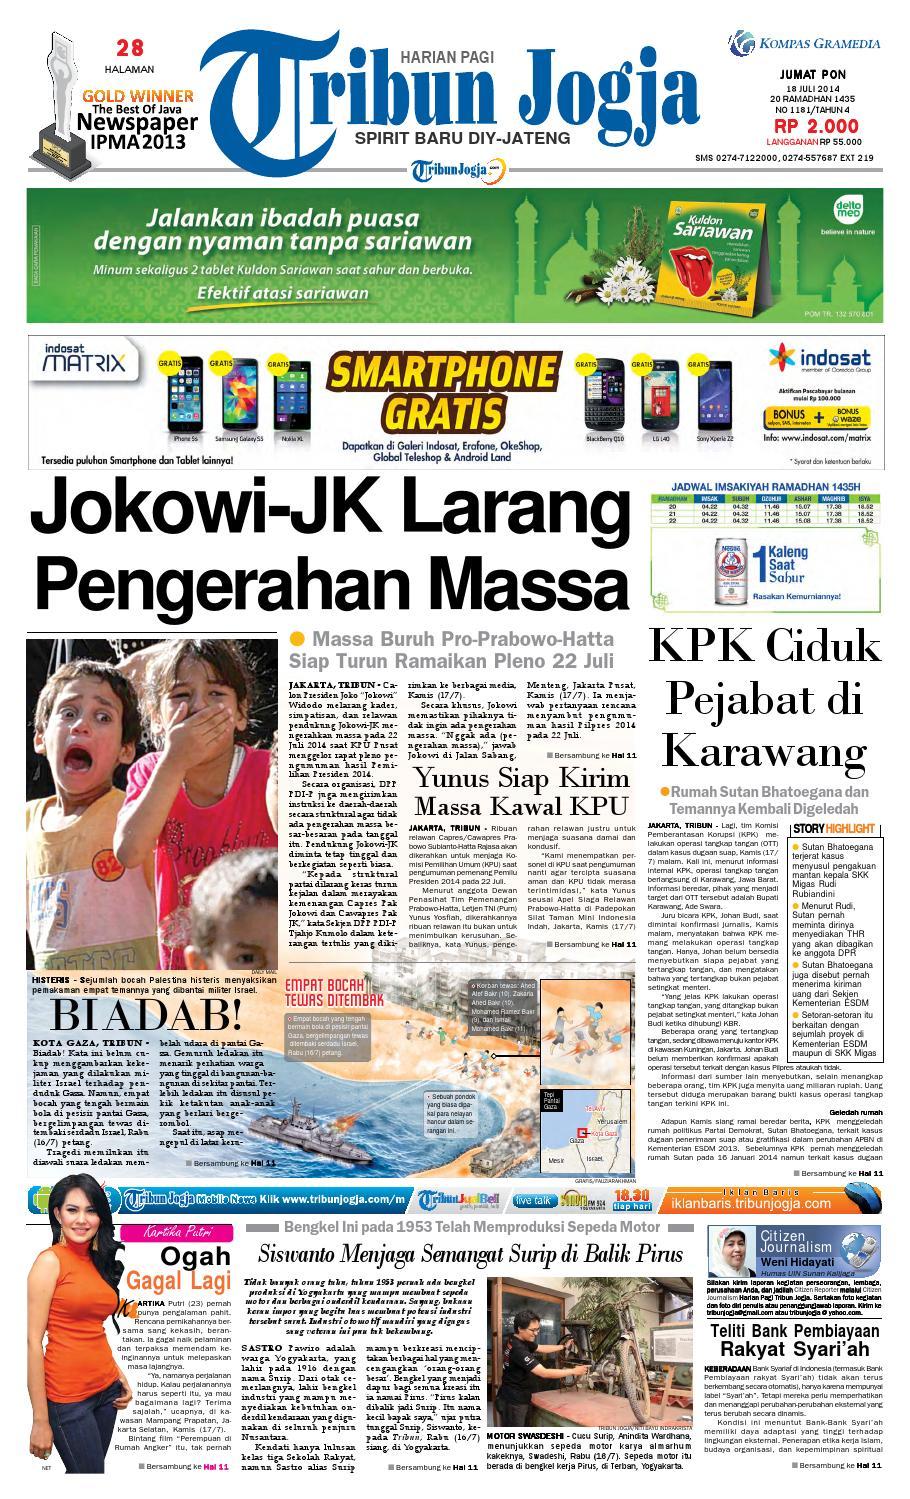 Tribunjogja 18 07 2014 By Tribun Jogja Issuu